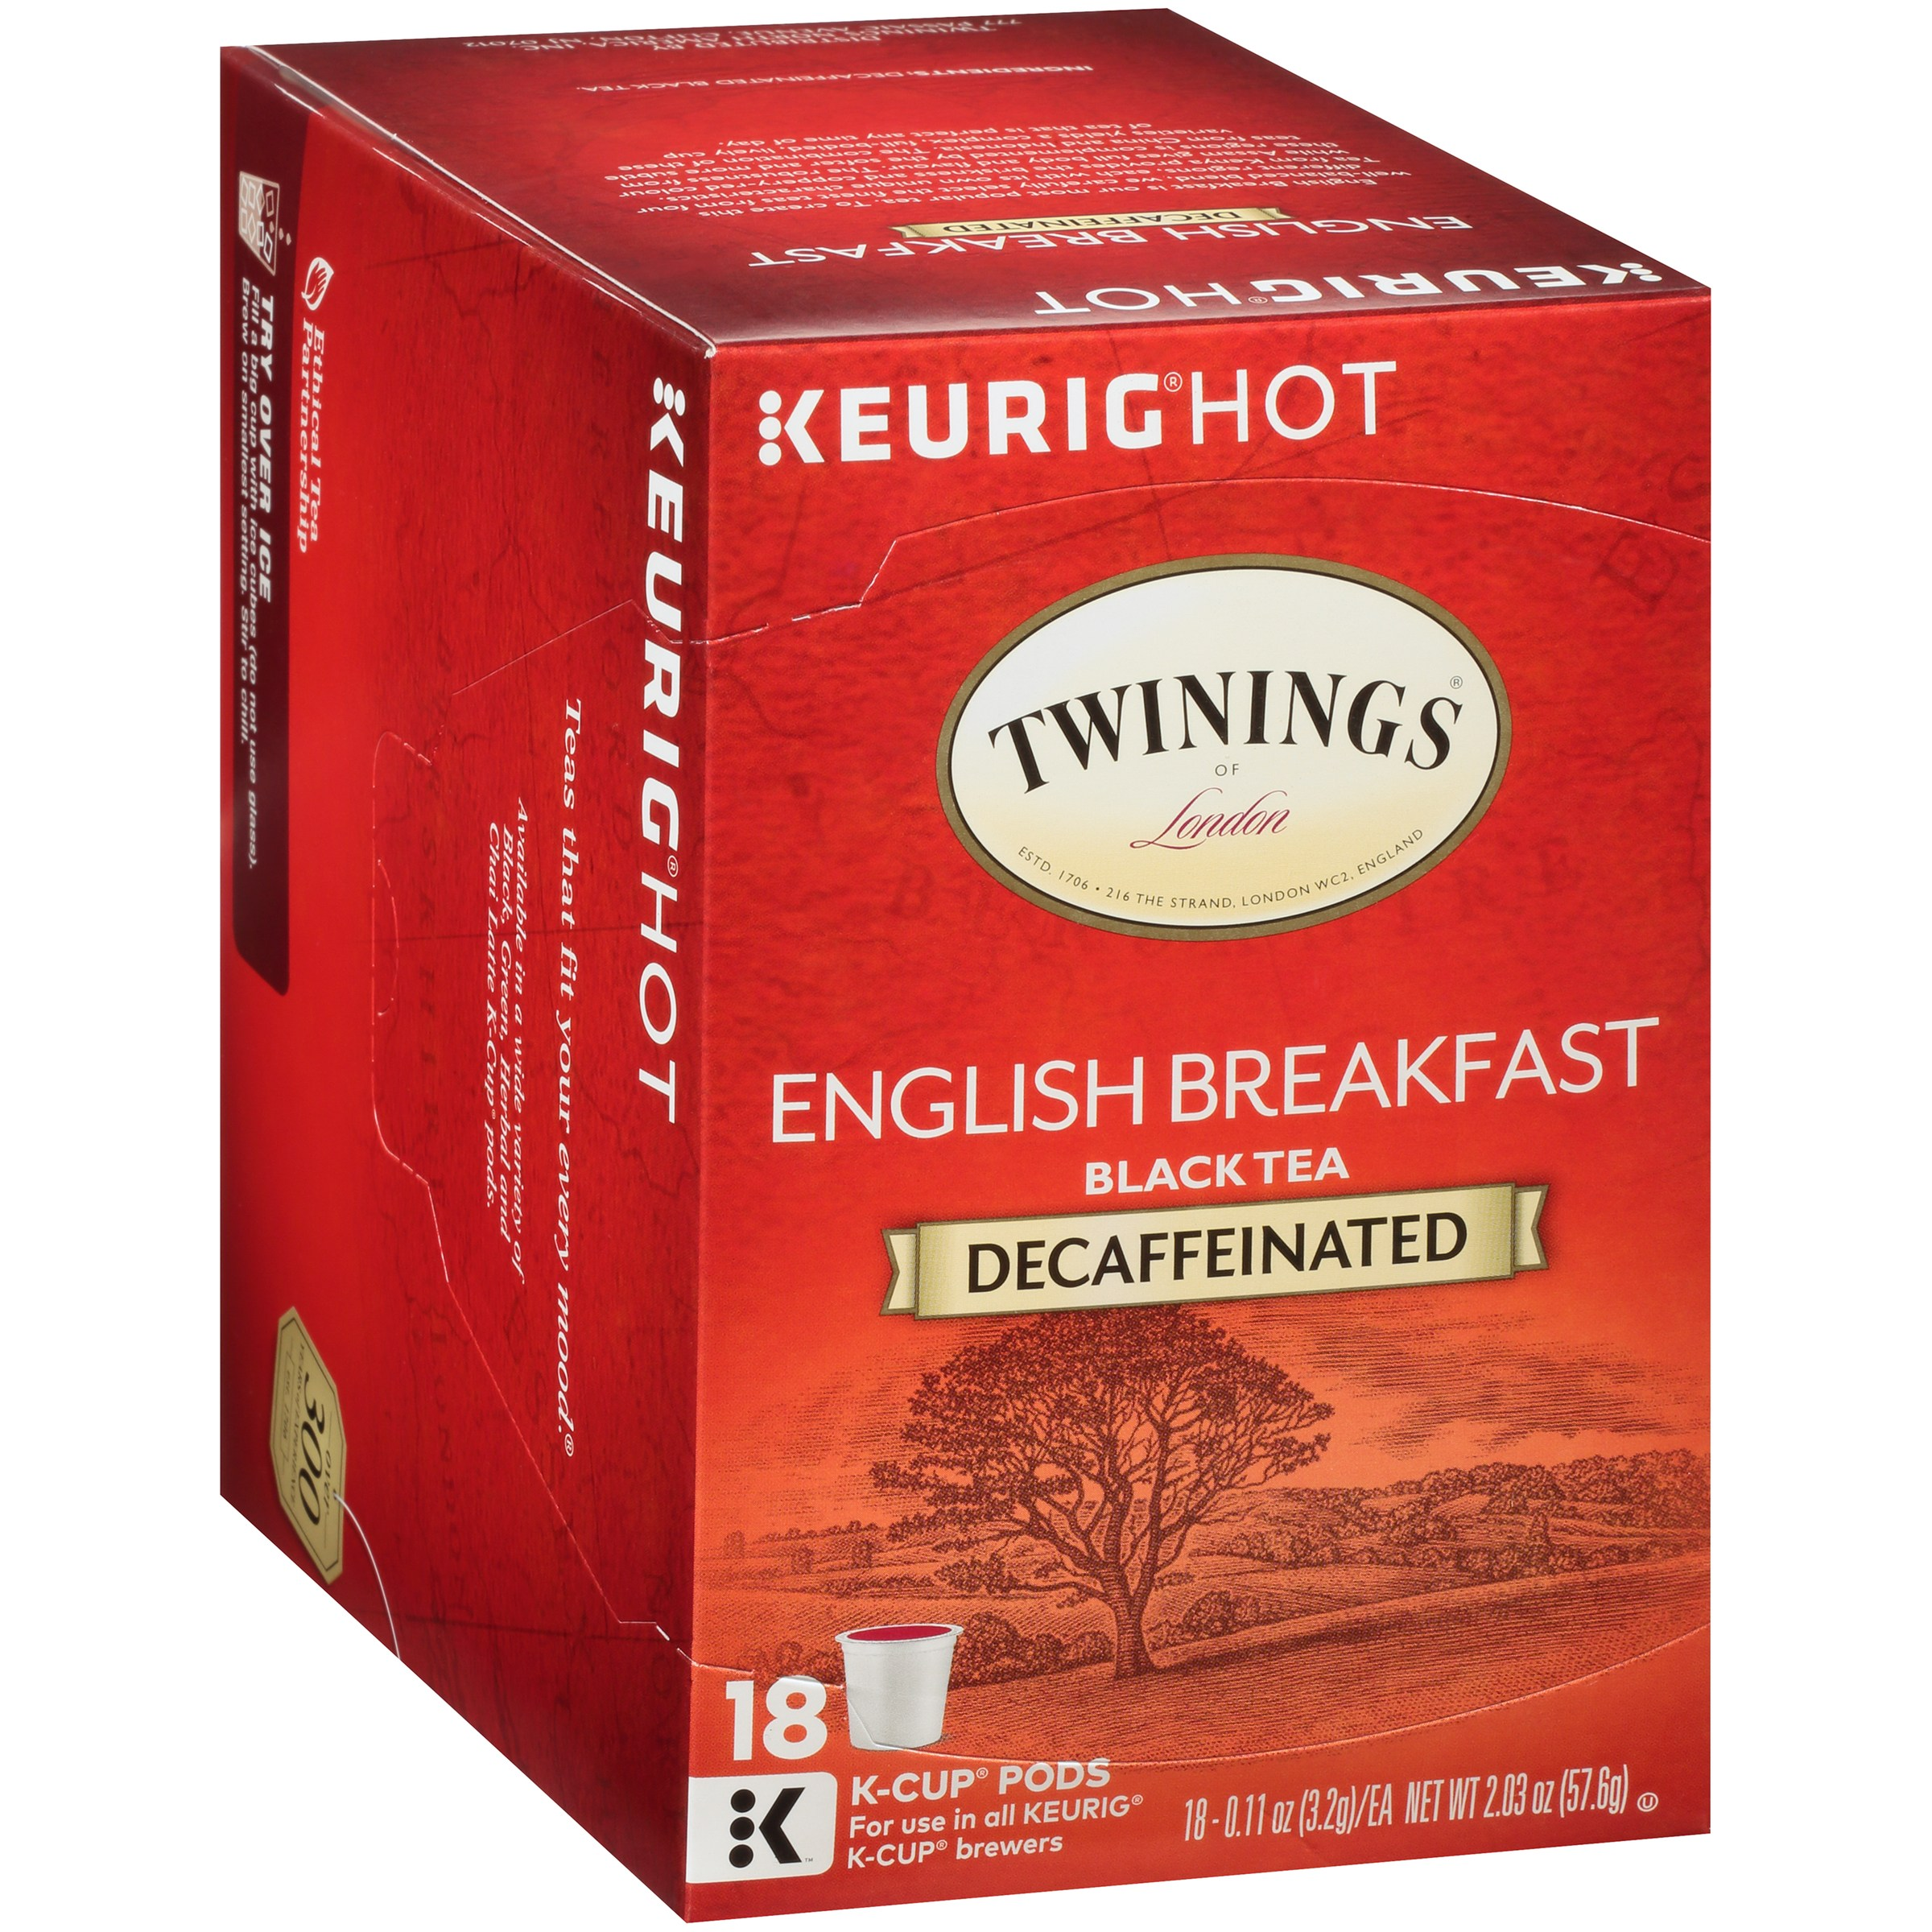 Twinings of London® Decaffeinated English Breakfast Tea 18 ct K-Cup® Pods 2.03 oz. Box